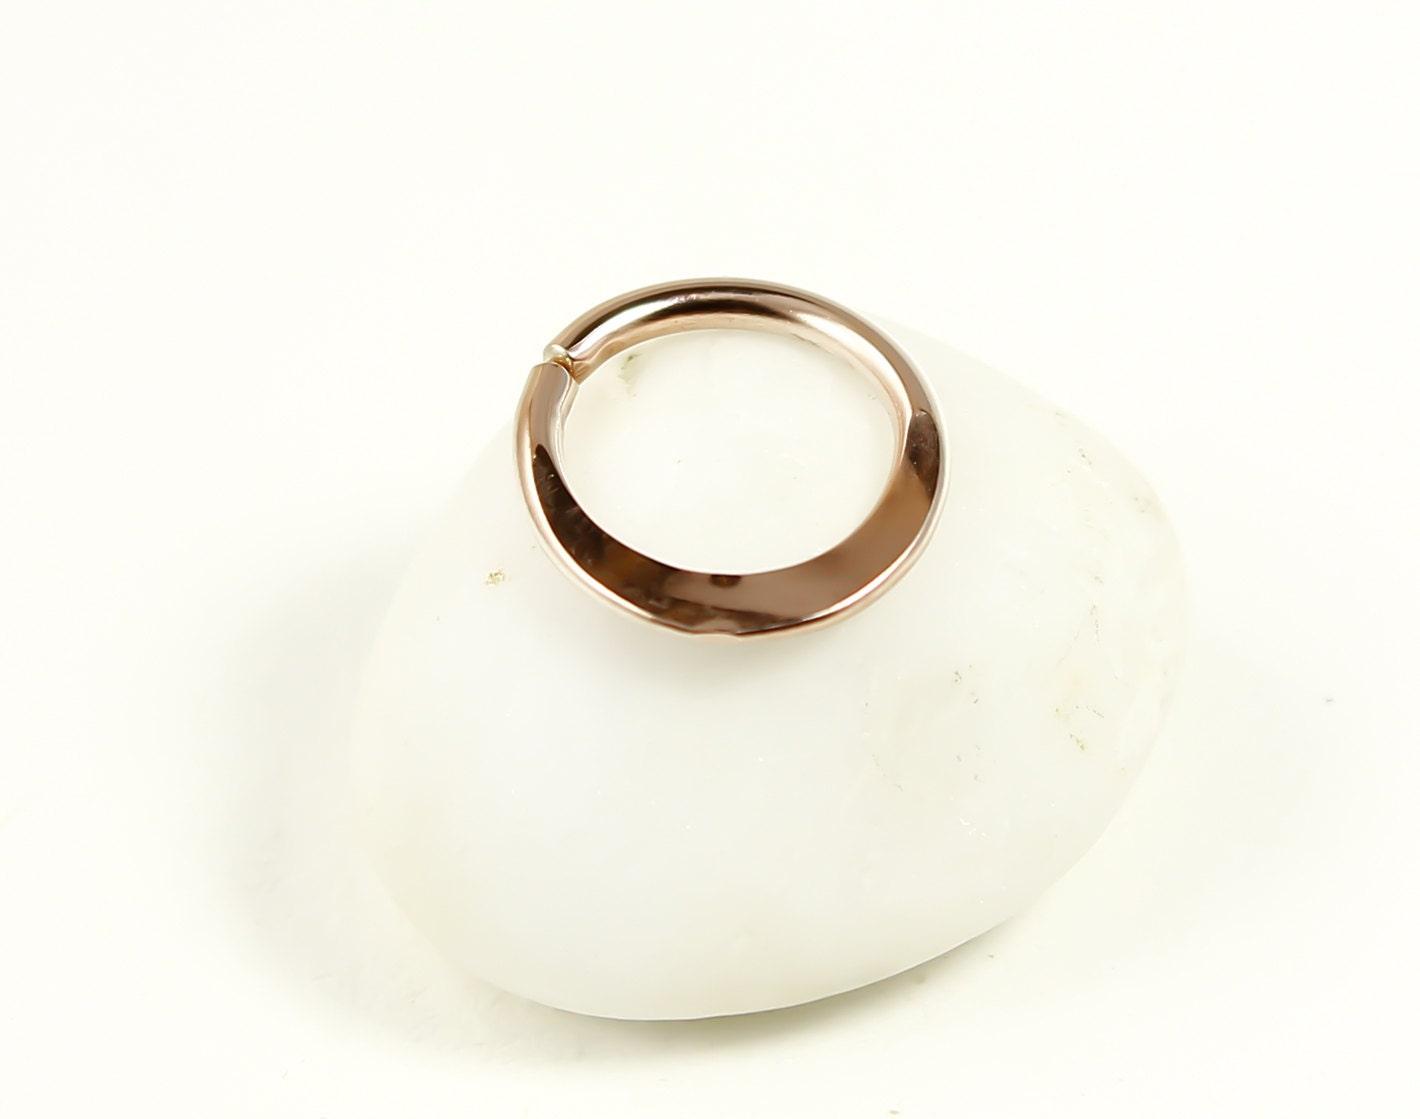 Gold Navel Ring Site Etsy Com